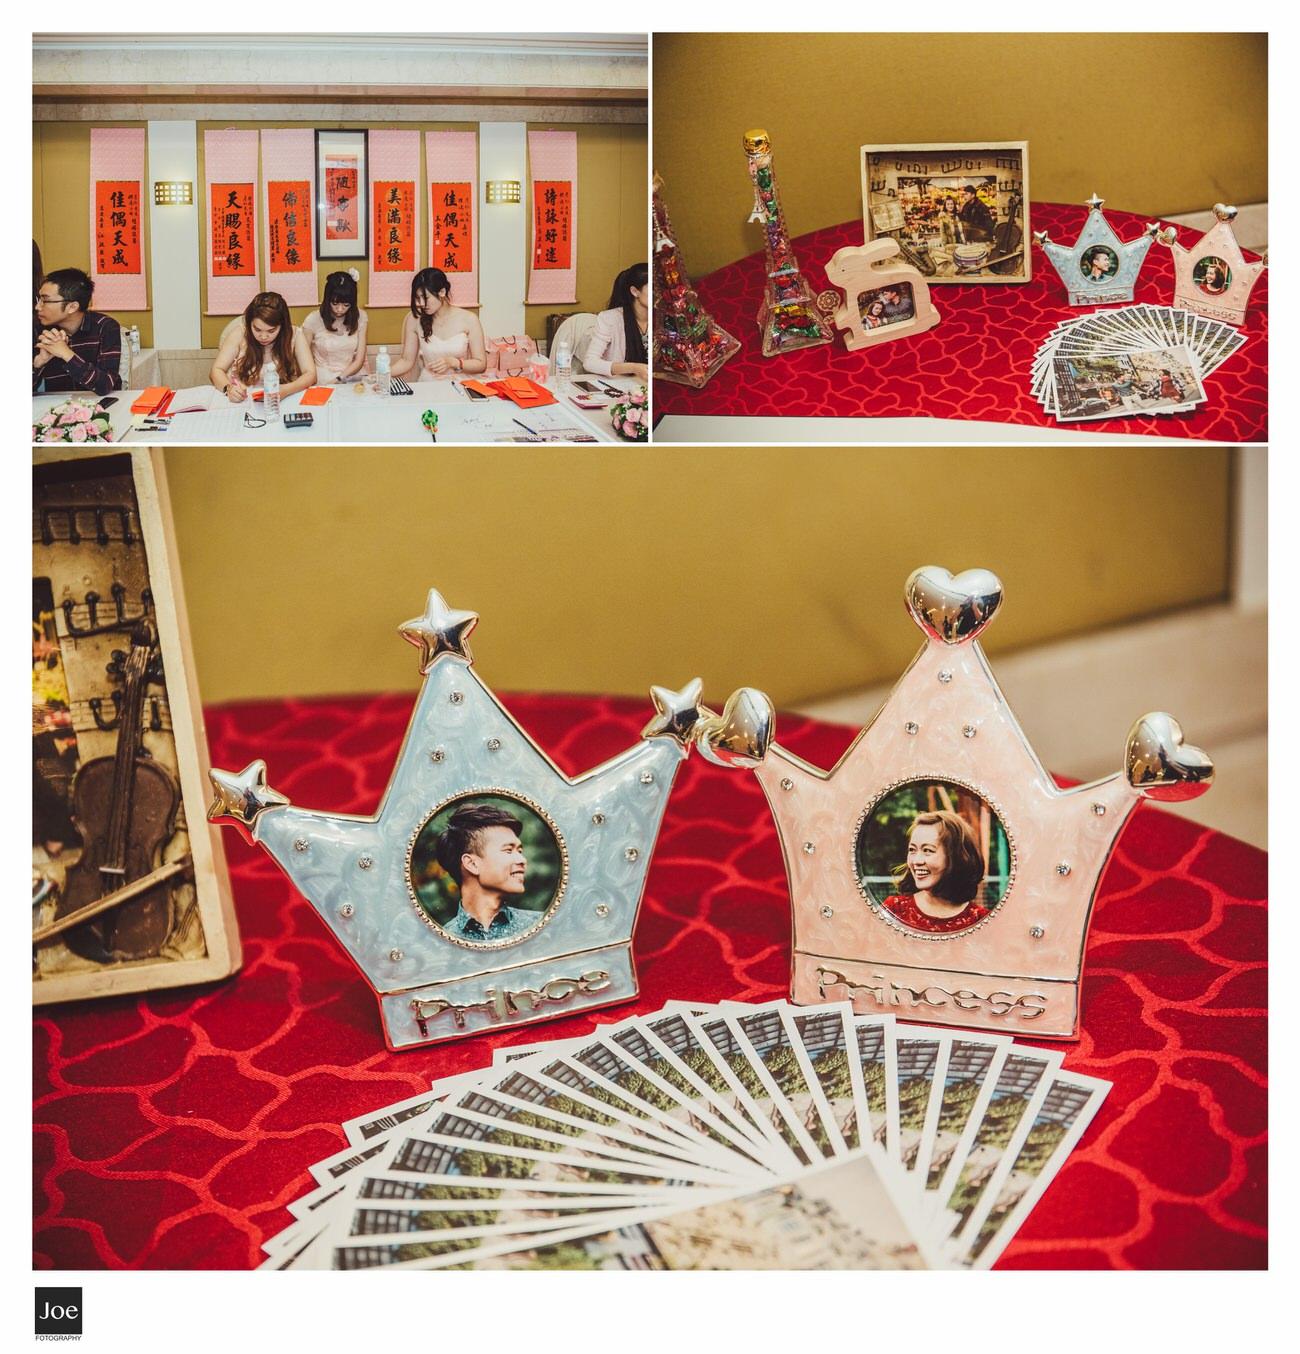 sunworld-dynasty-hotel-taipei-wedding-photo-joe-fotography-angel-jay-070.jpg